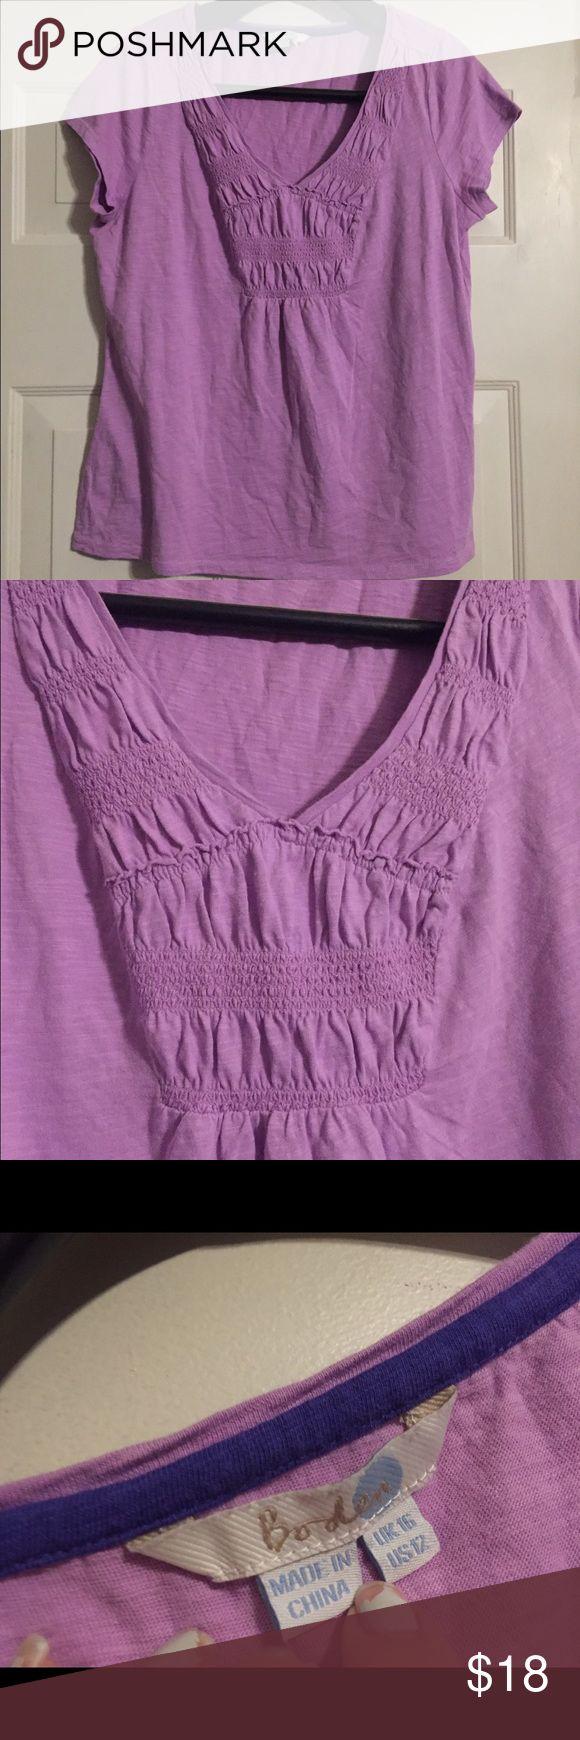 Boden lavender size 12 shirt. EUC WB-100 Smoke and pet free home. Bundle discount 20% Boden Tops